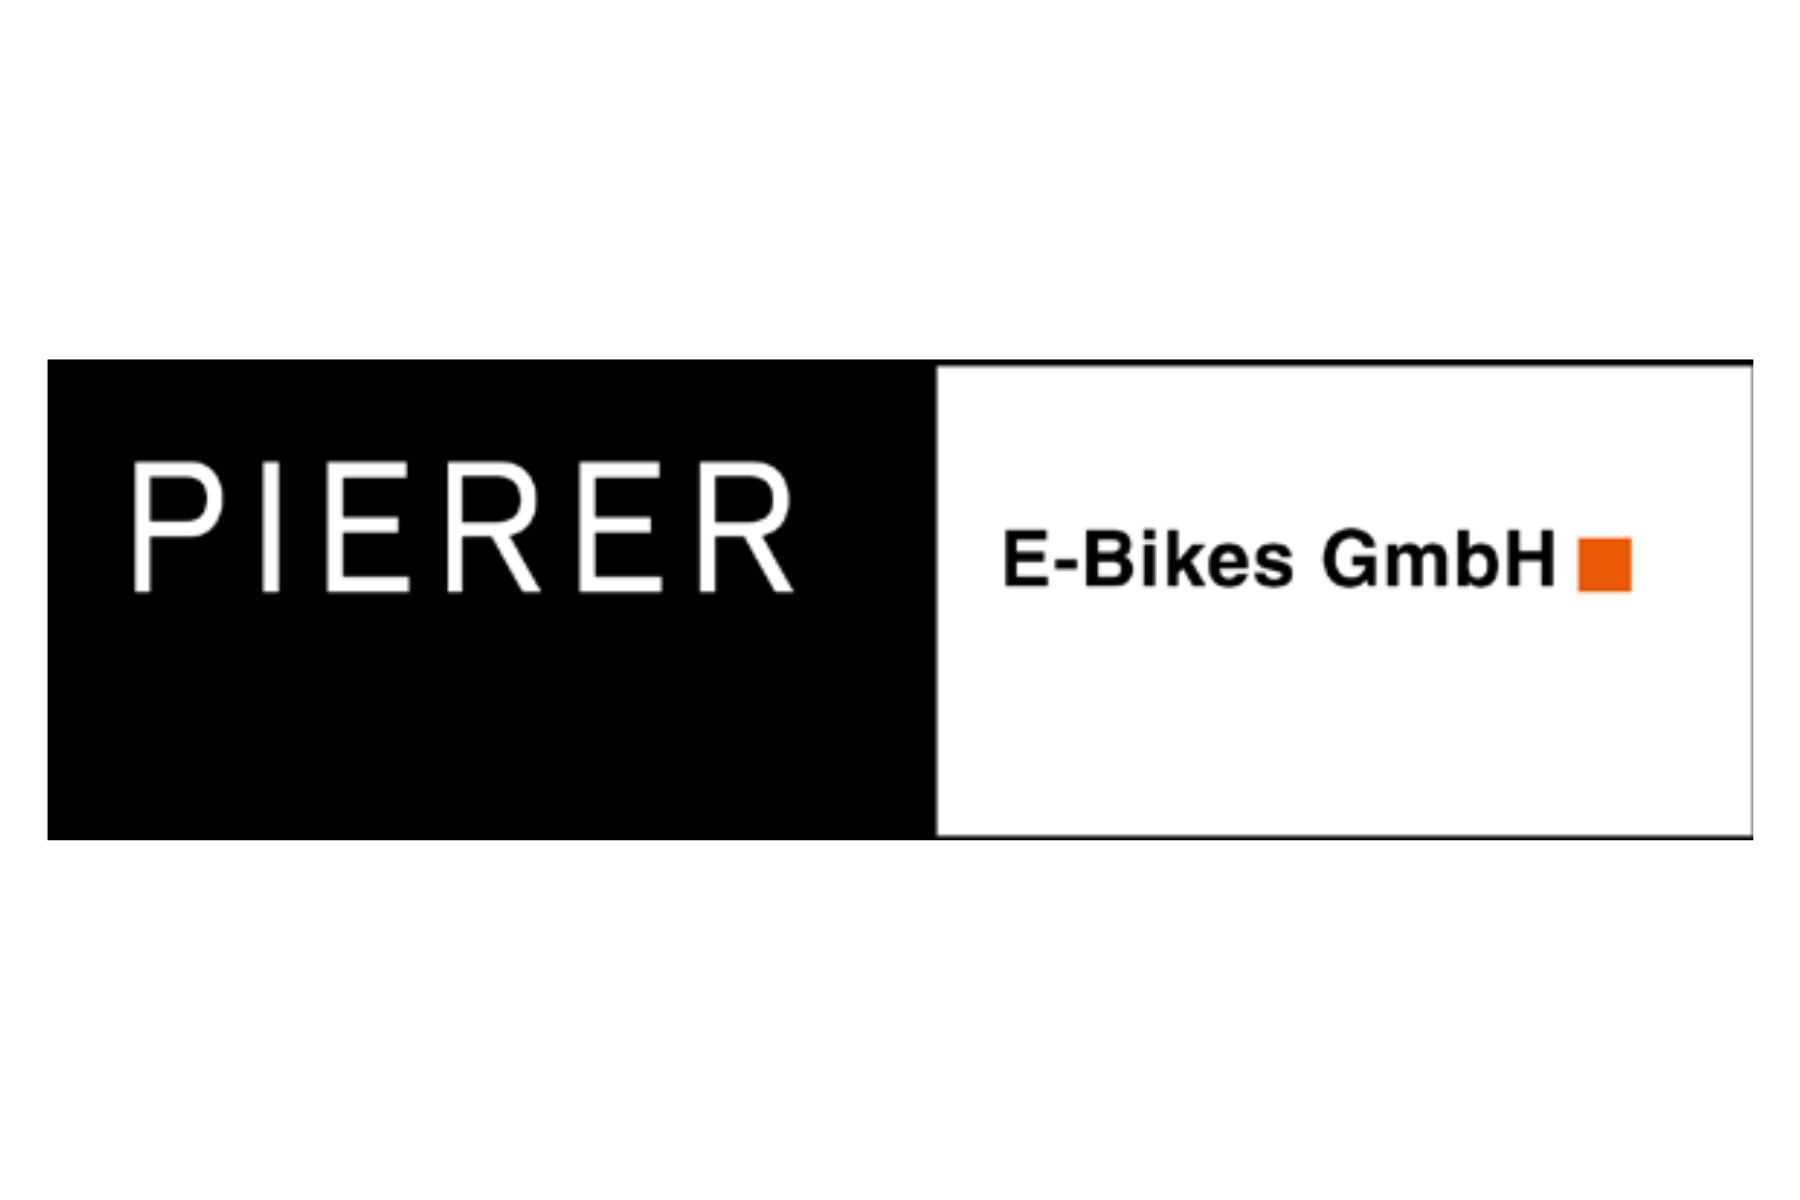 PIERER E-Bikes GmbH verstärkt Führungsriege